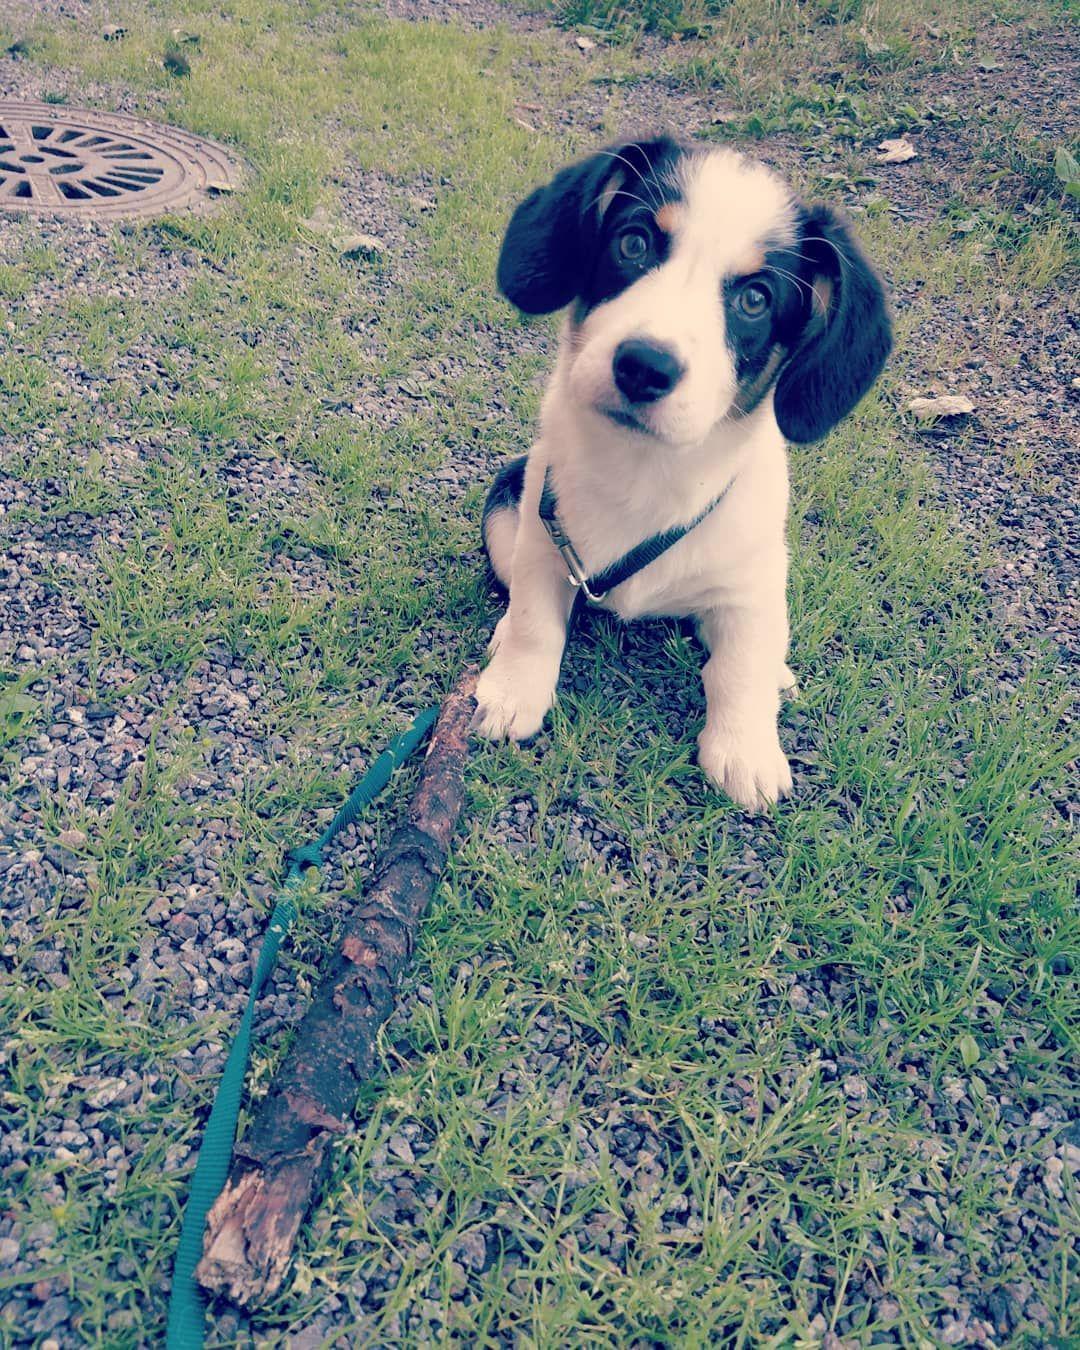 The Most Glorious Stick Ever Corgi Drever Pembrokewelshcorgi Welshcorgi Dreeveri Puppy Puppylove Puppi Welsh Corgi Pembroke Welsh Corgi Puppies